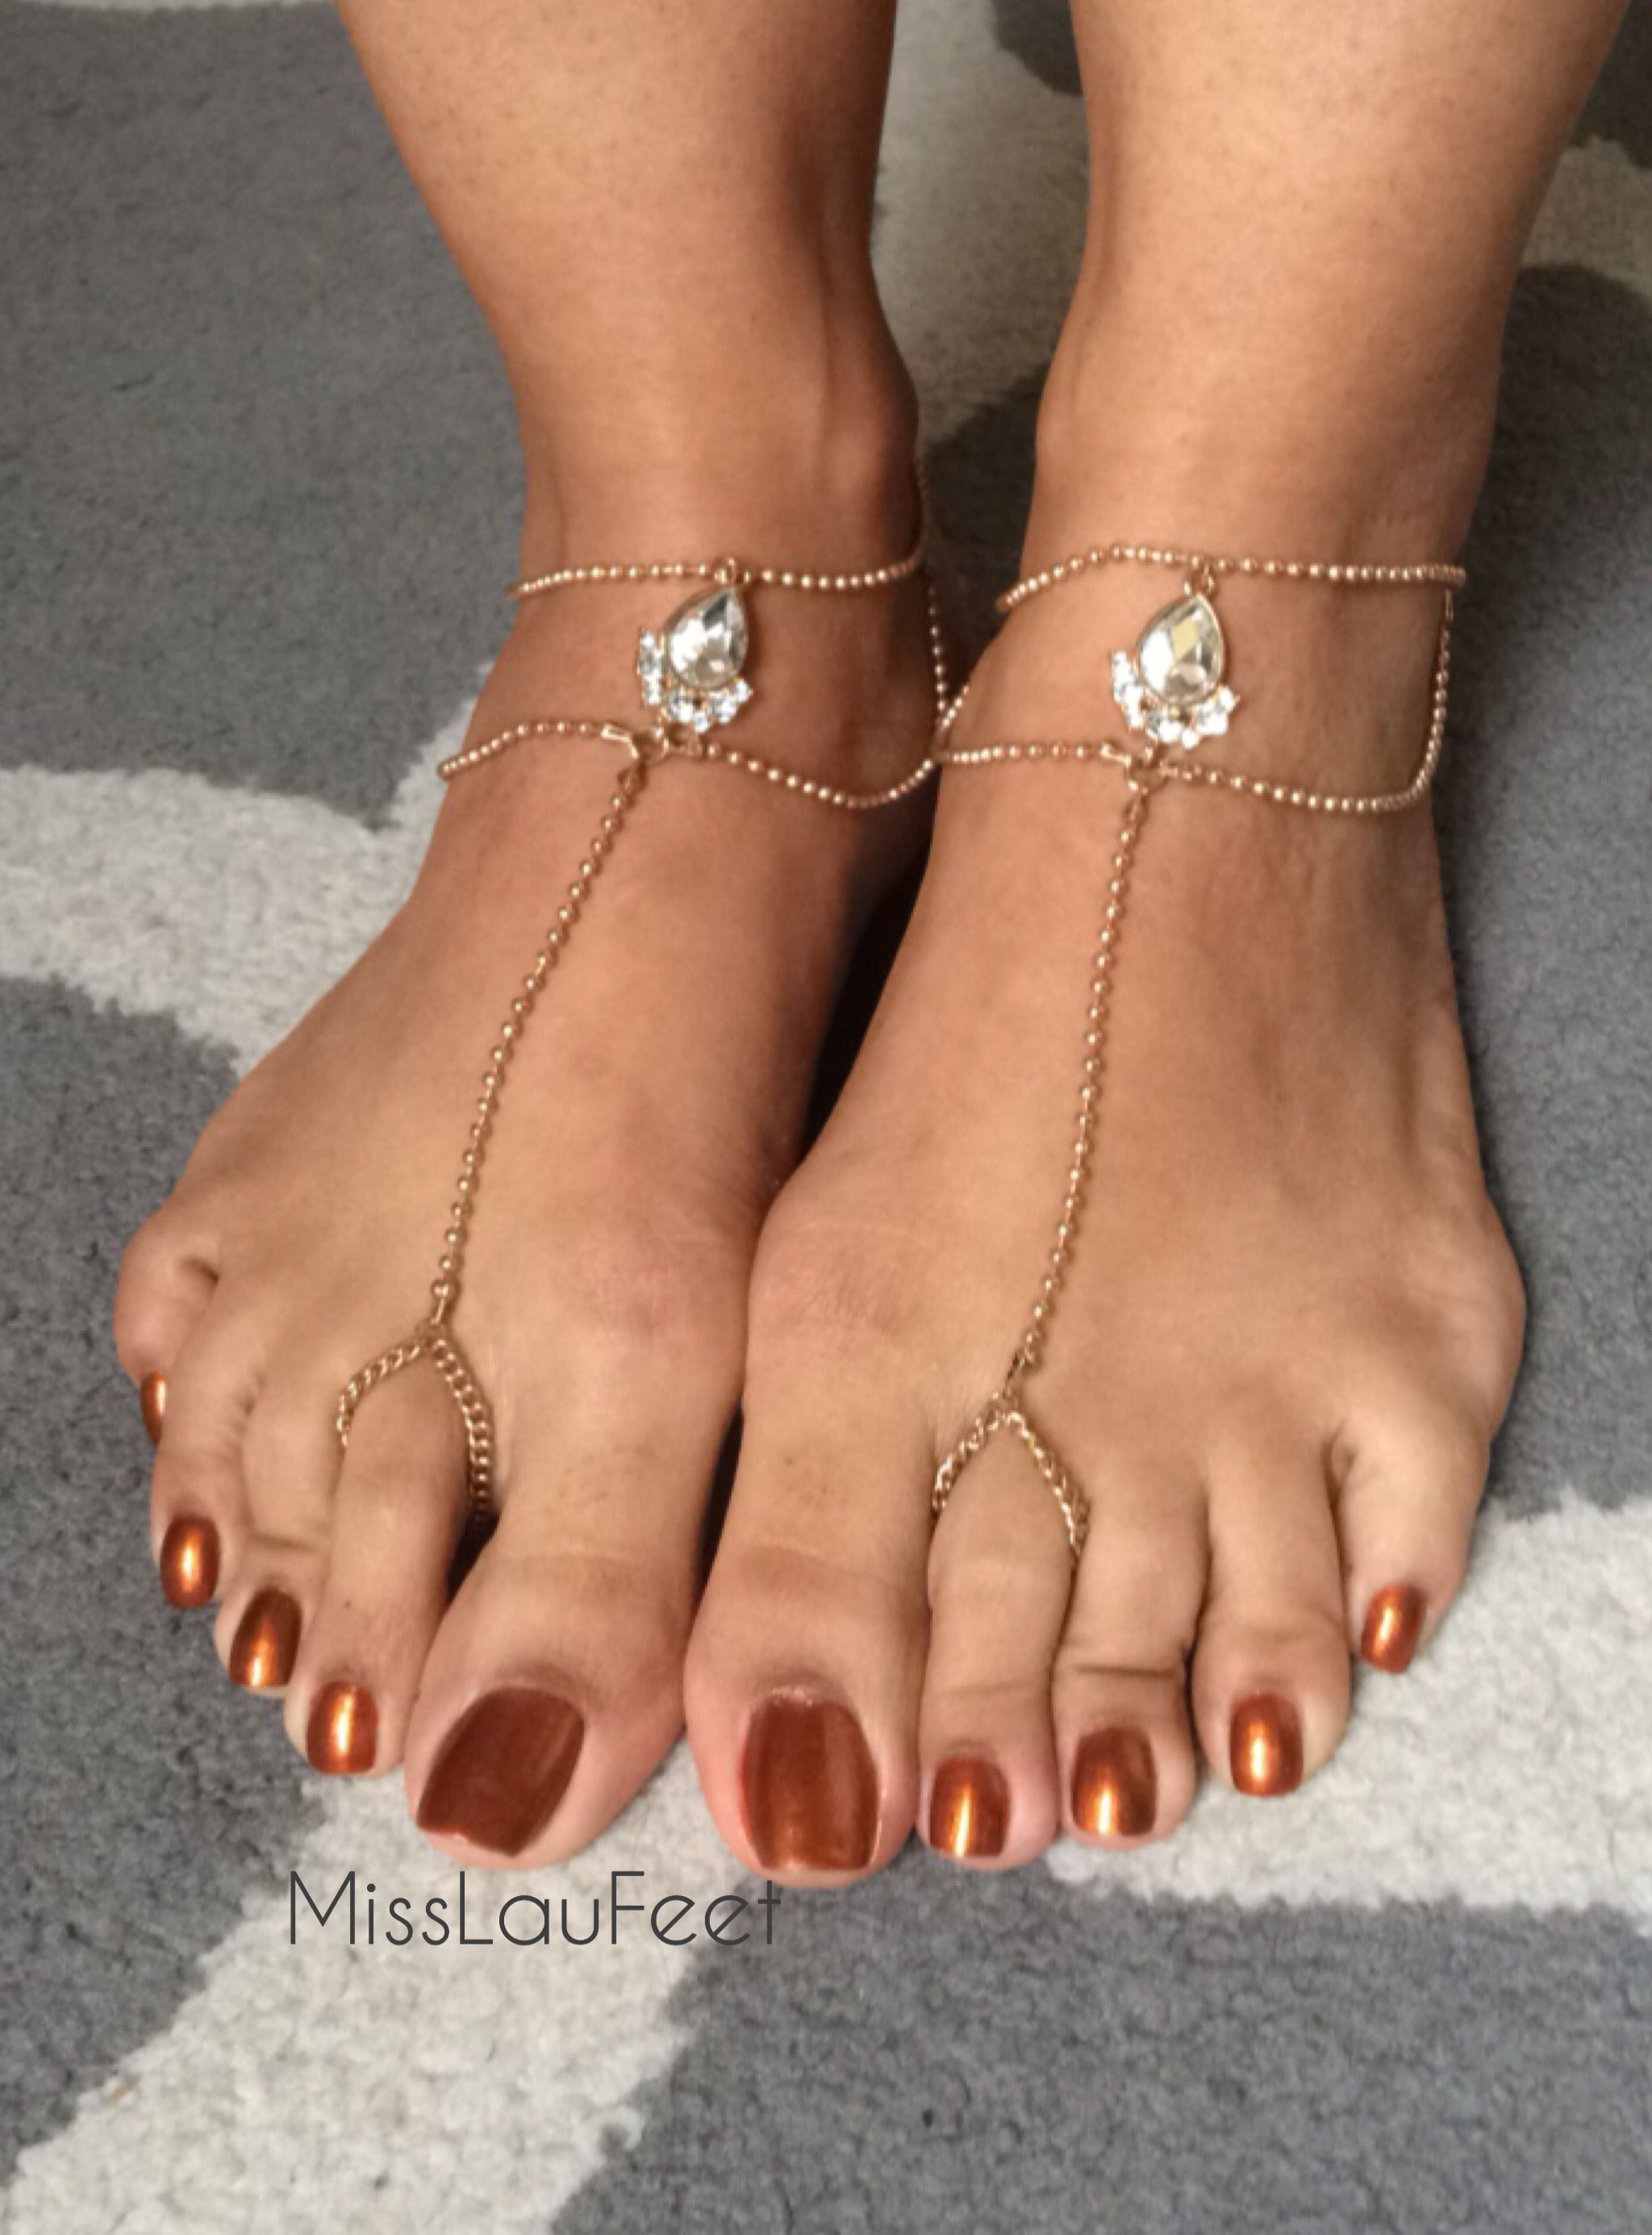 Pin By MissLauFeet On Miss Lau Feet In 2019